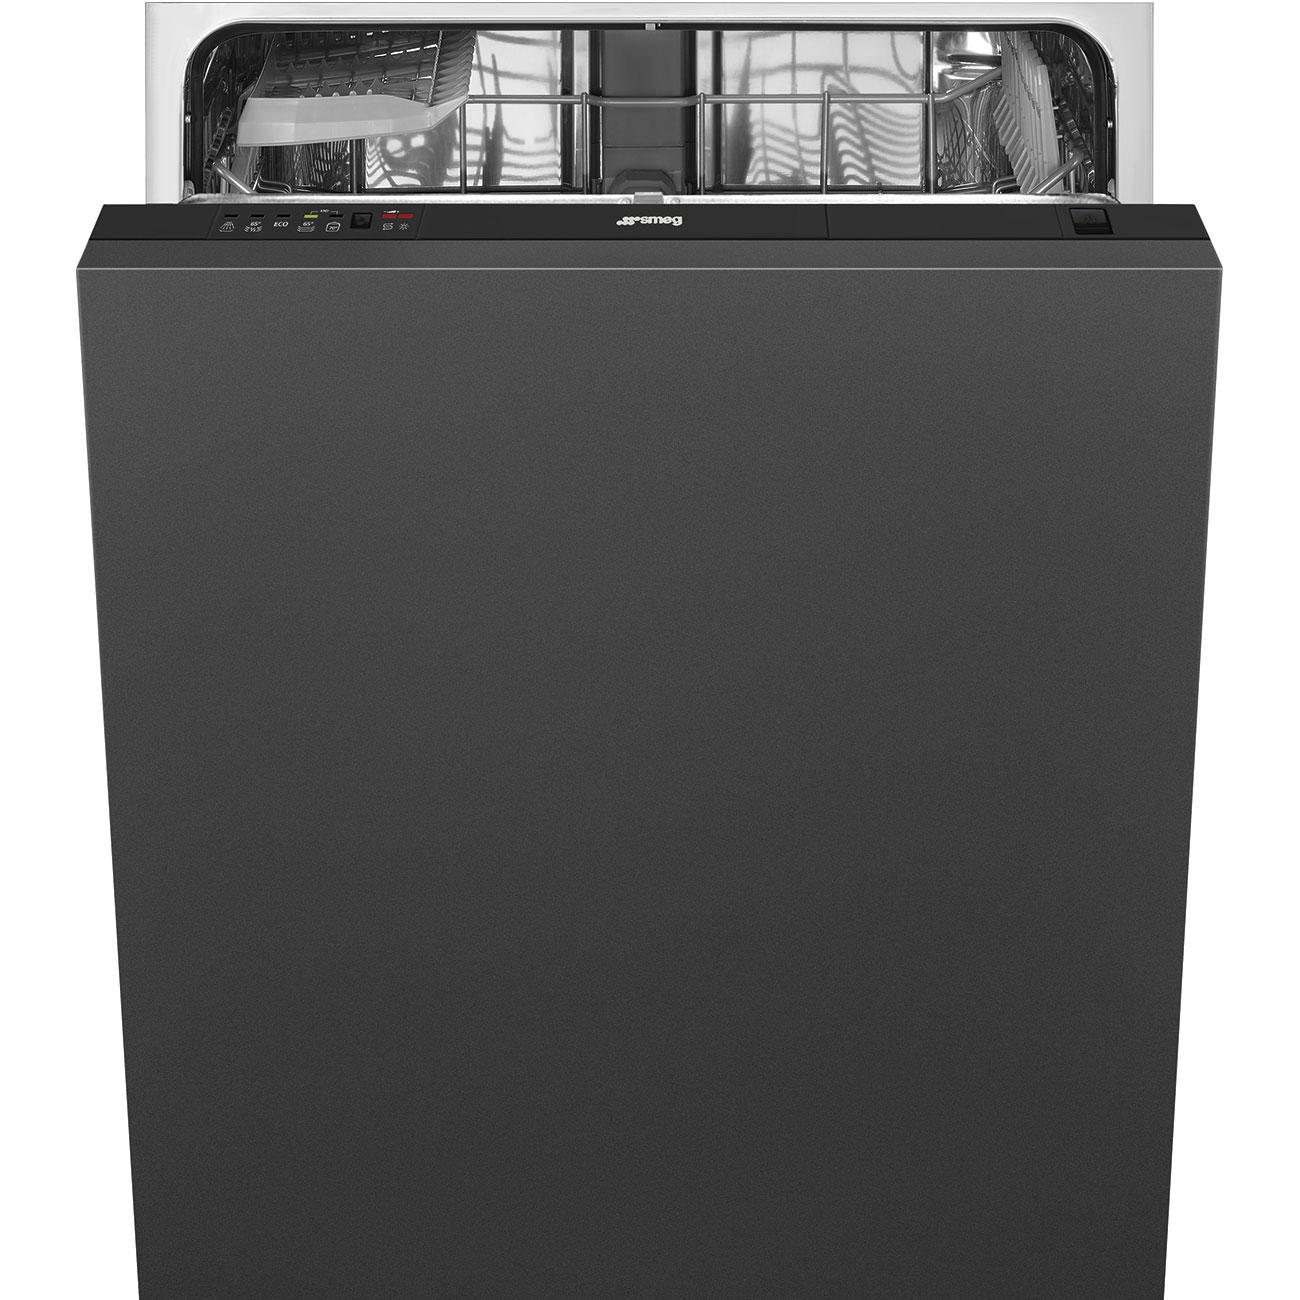 ST65120